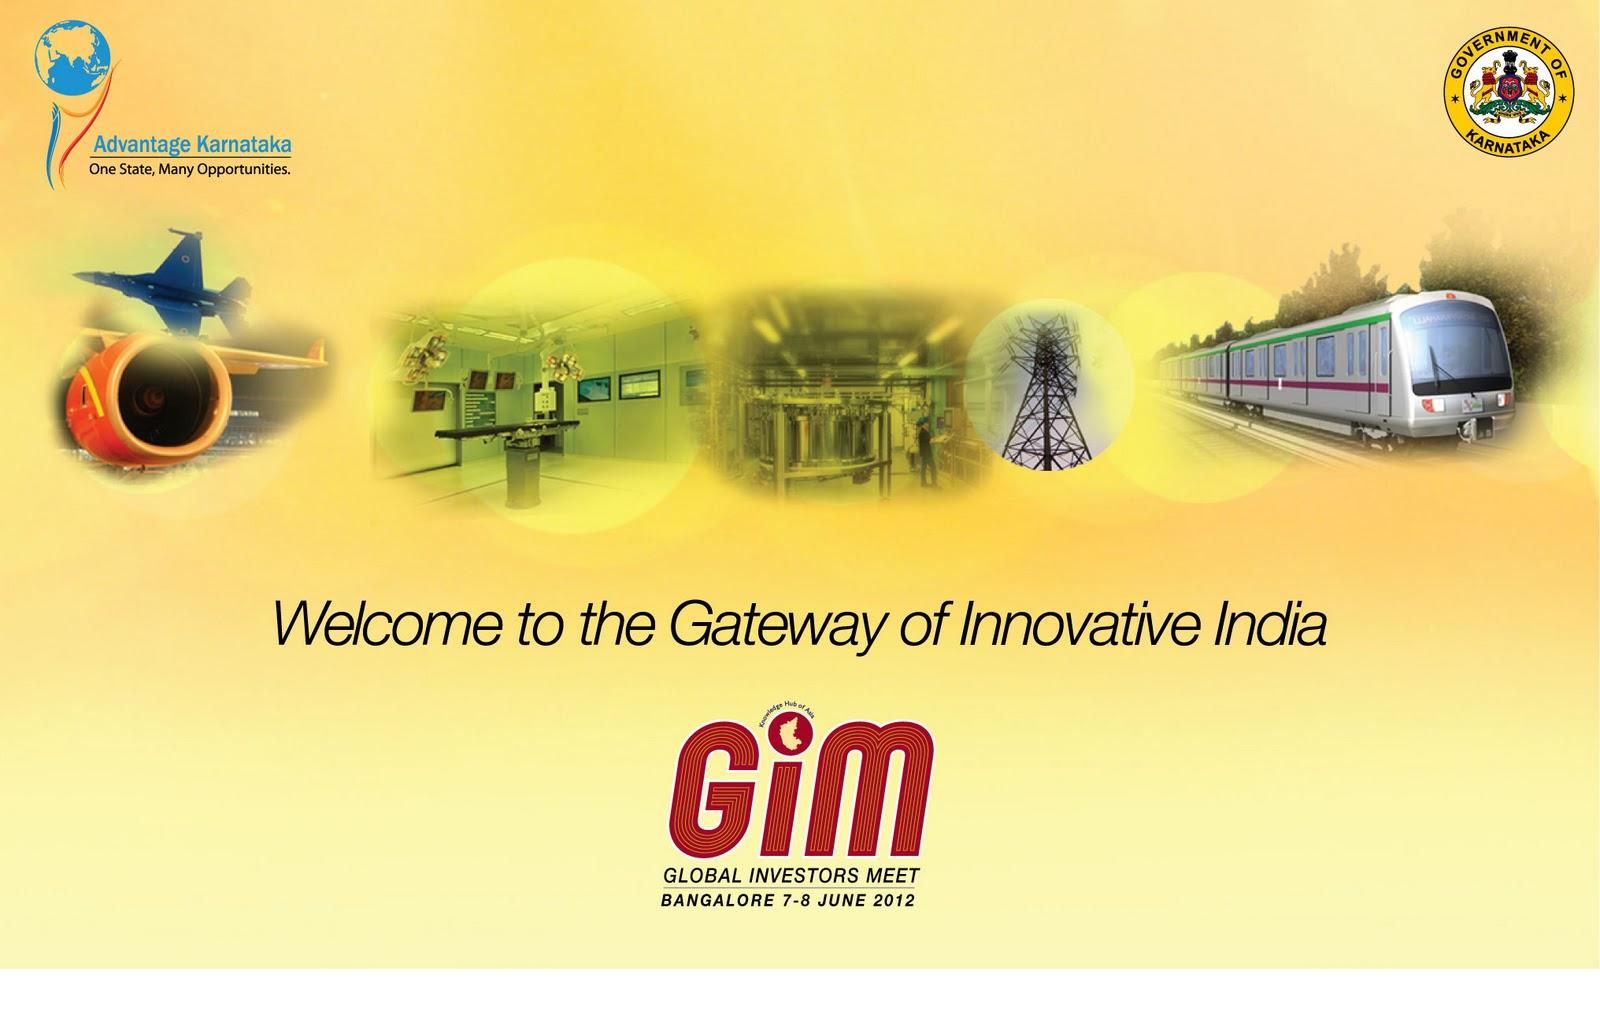 global investors meet bangalore 2012 venue